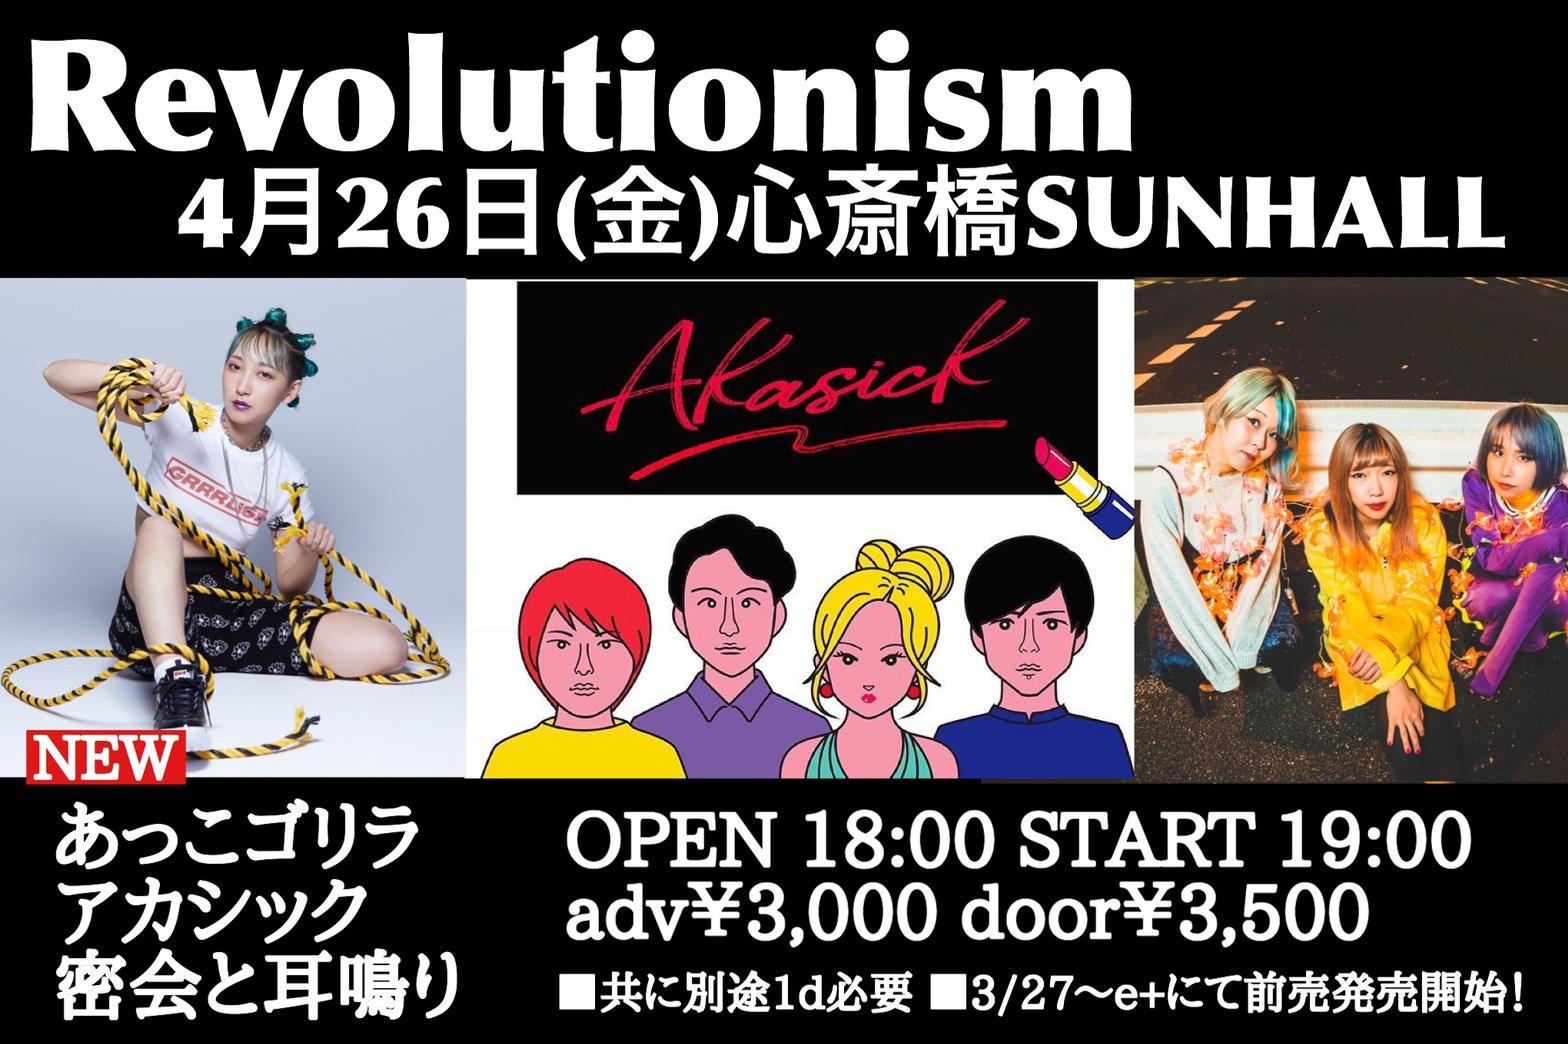 Revolutionism